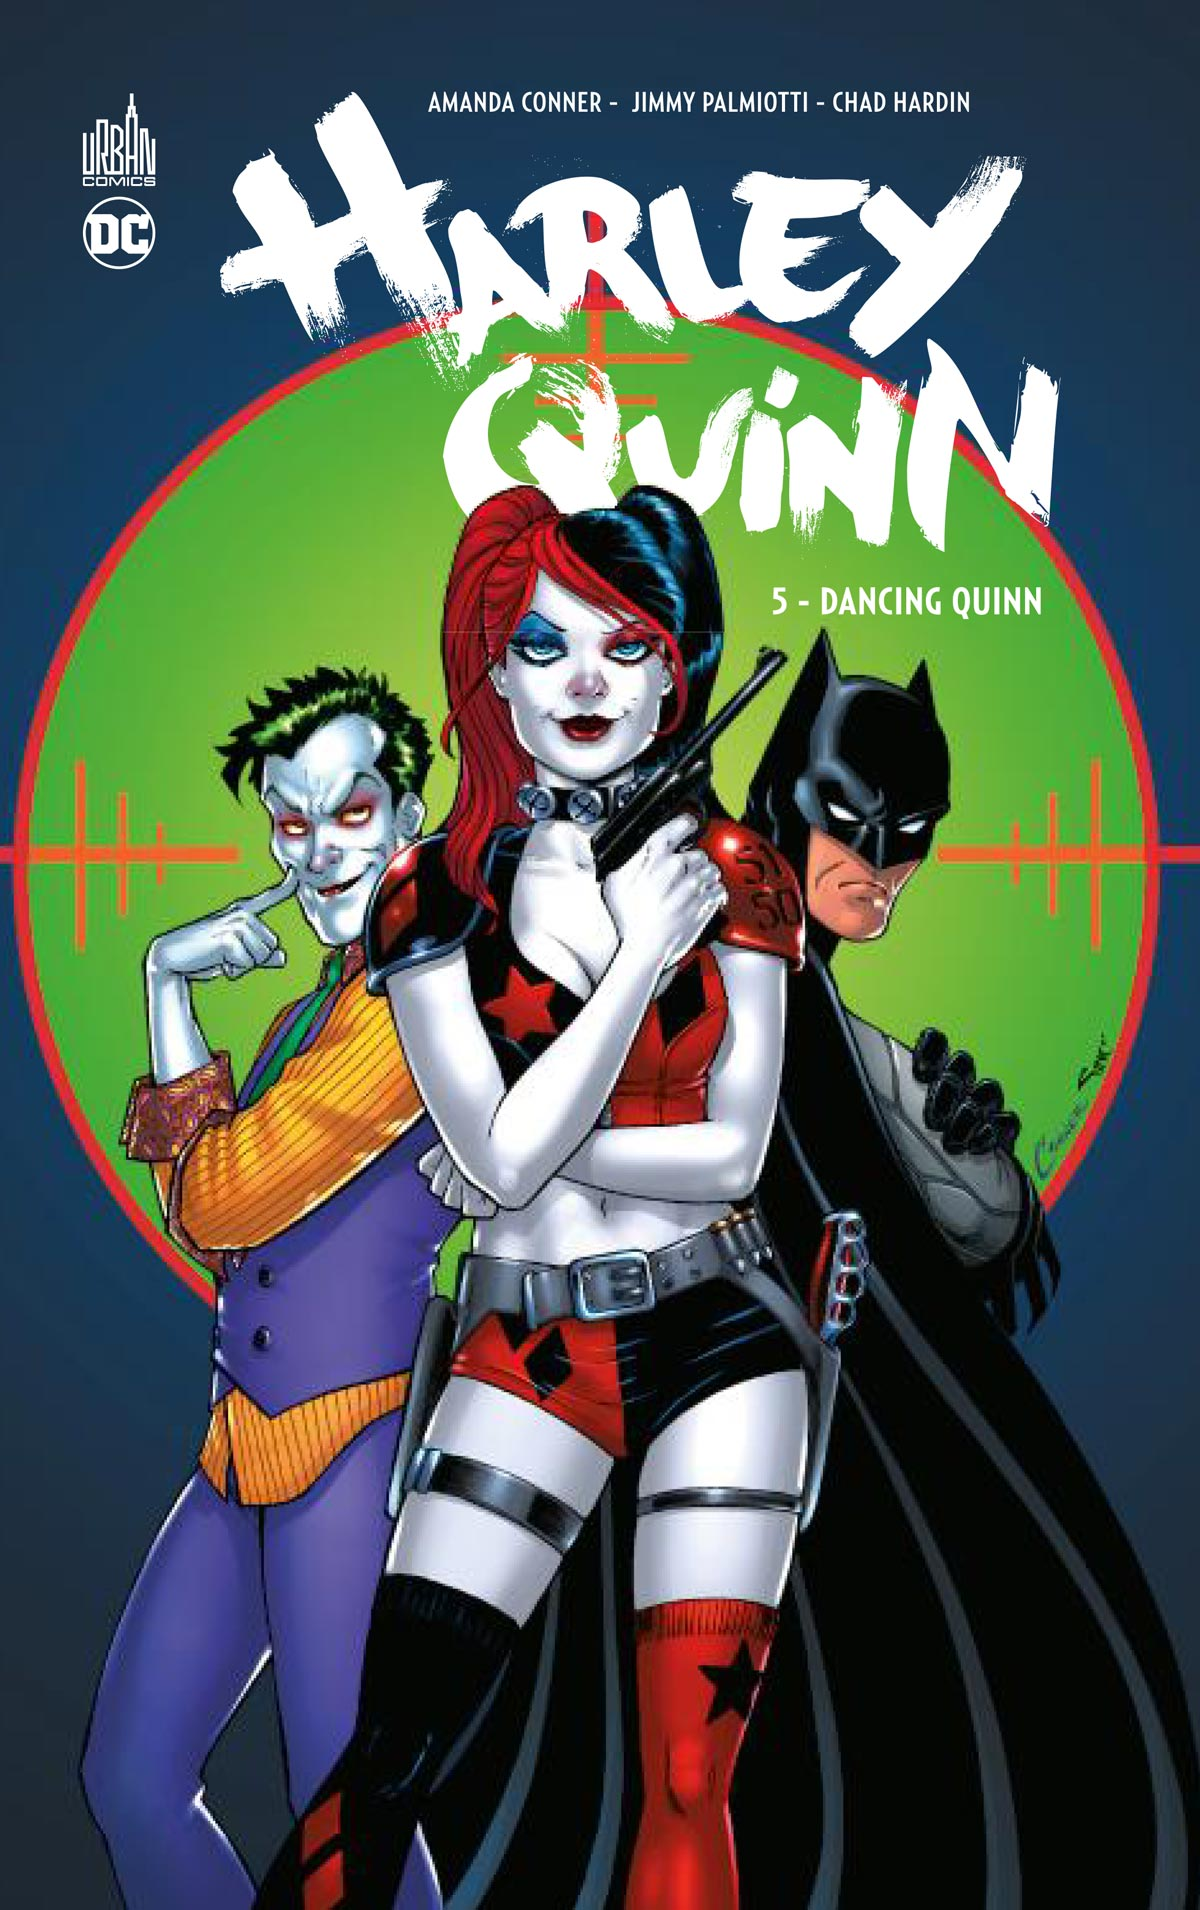 Harley Quinn T5 : Dancing Quinn (0), comics chez Urban Comics de Palmiotti, Conner, Hardin, Sinclair, Mounts